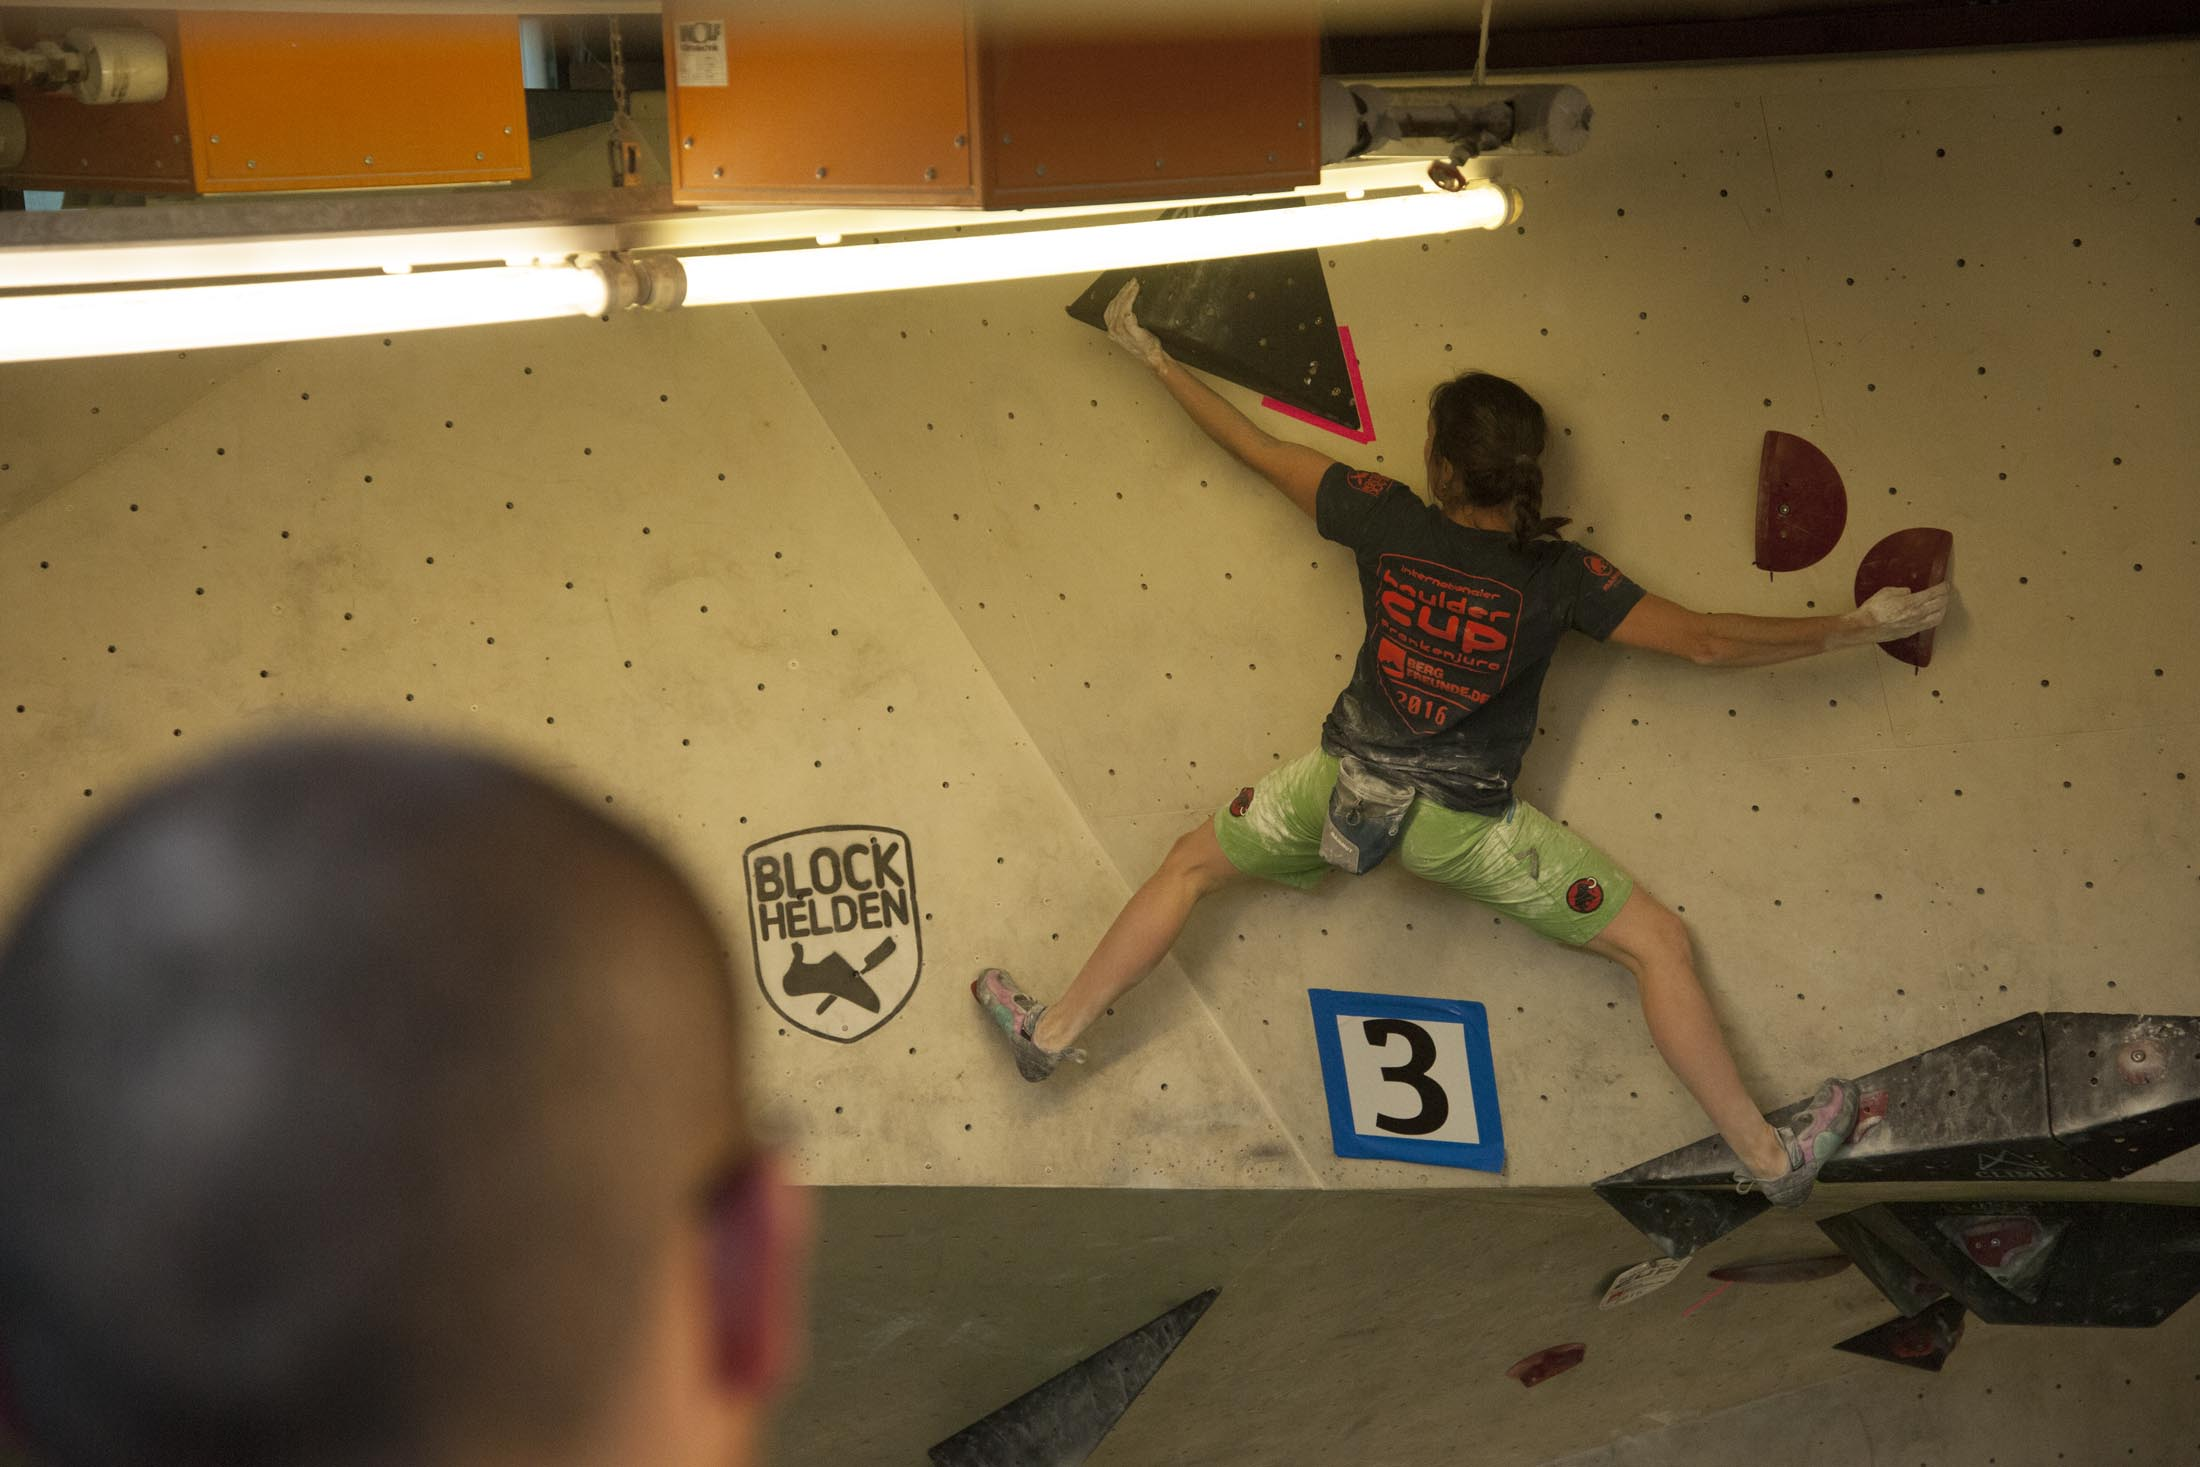 Finale, internationaler bouldercup Frankenjura 2016, BLOCKHELDEN Erlangen, Mammut, Bergfreunde.de, Boulderwettkampf07092016705